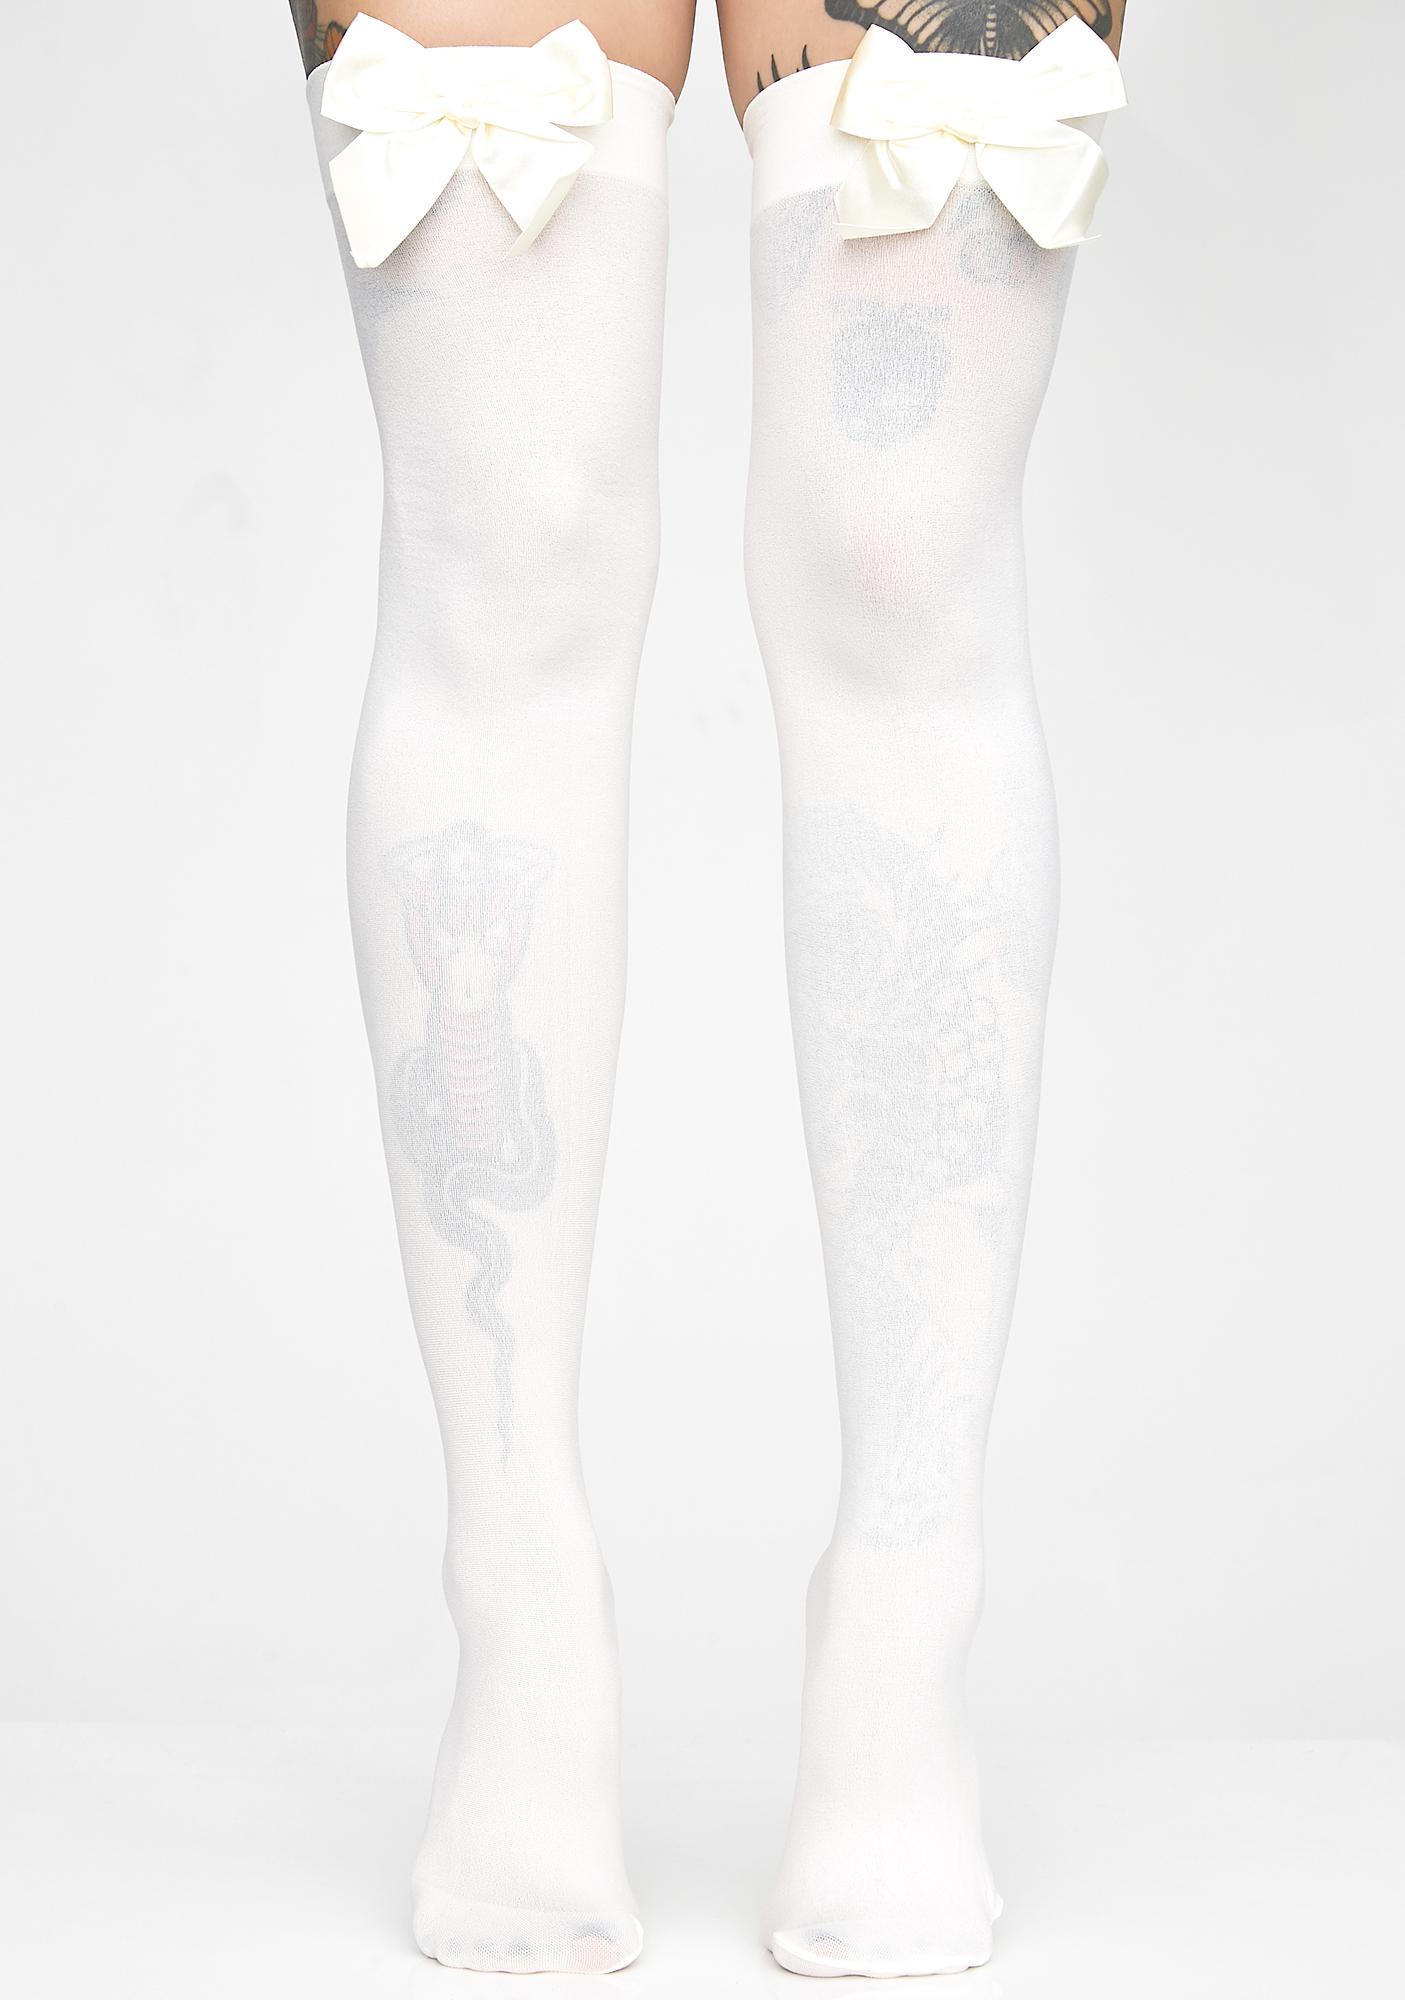 ac2331142 Satin Bow Opaque Thigh High Socks